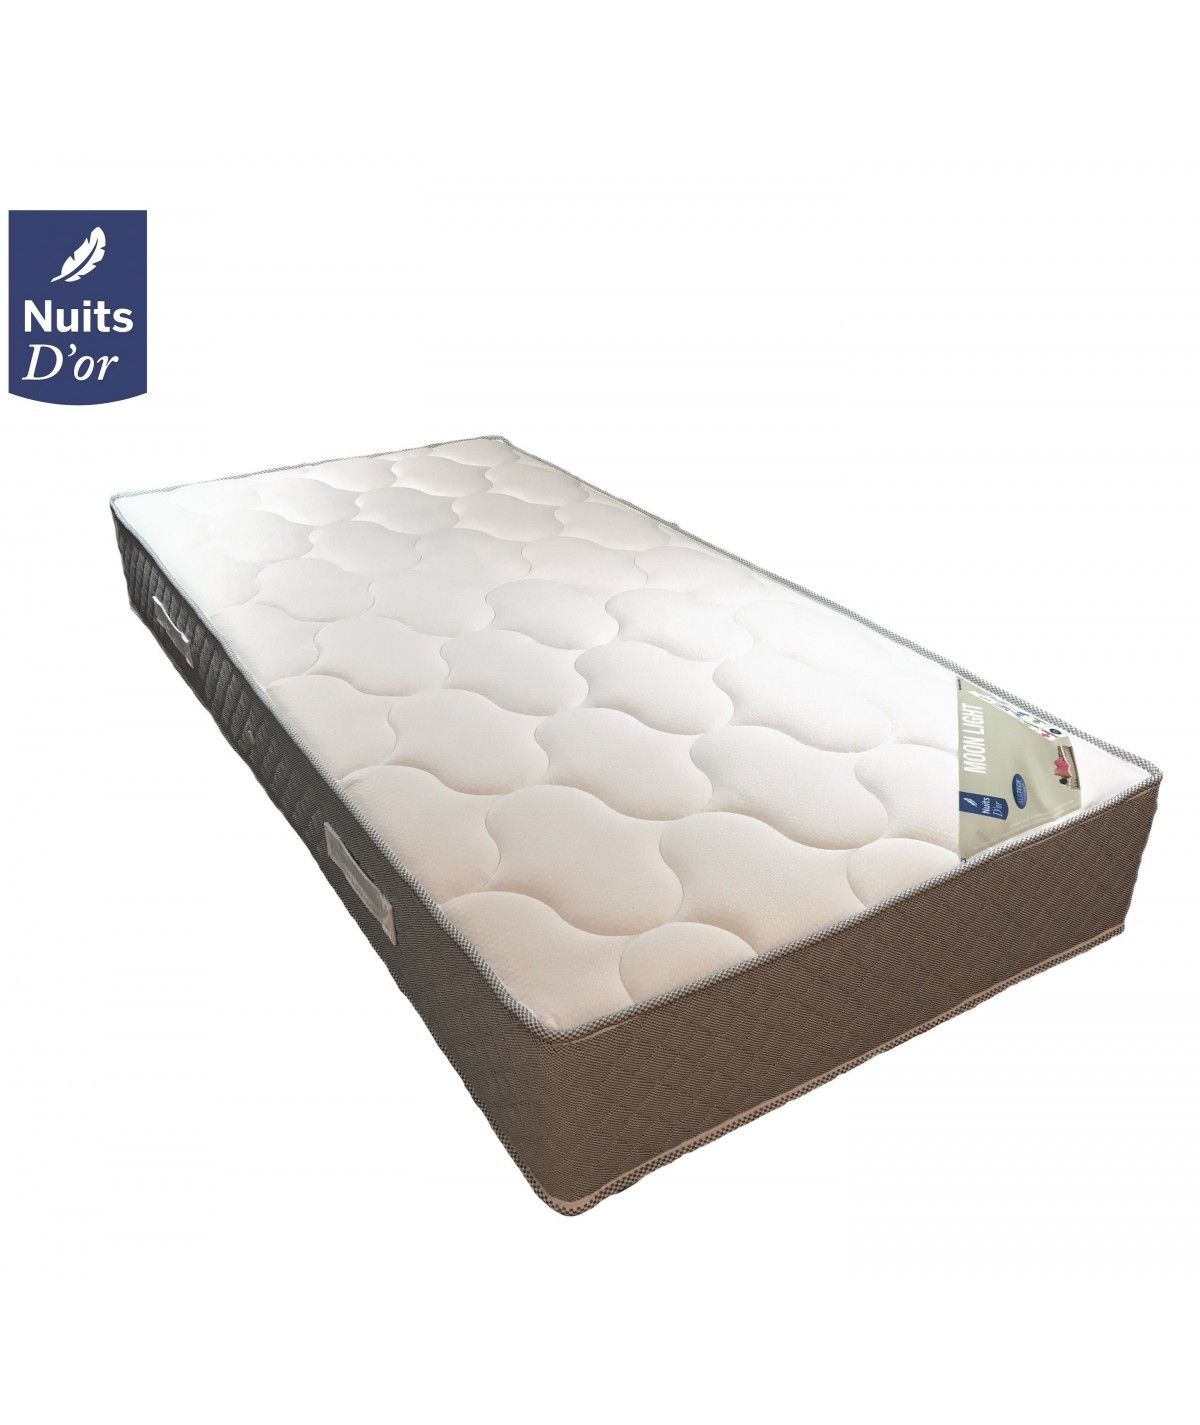 canape densite 35 kg m3 maison design. Black Bedroom Furniture Sets. Home Design Ideas